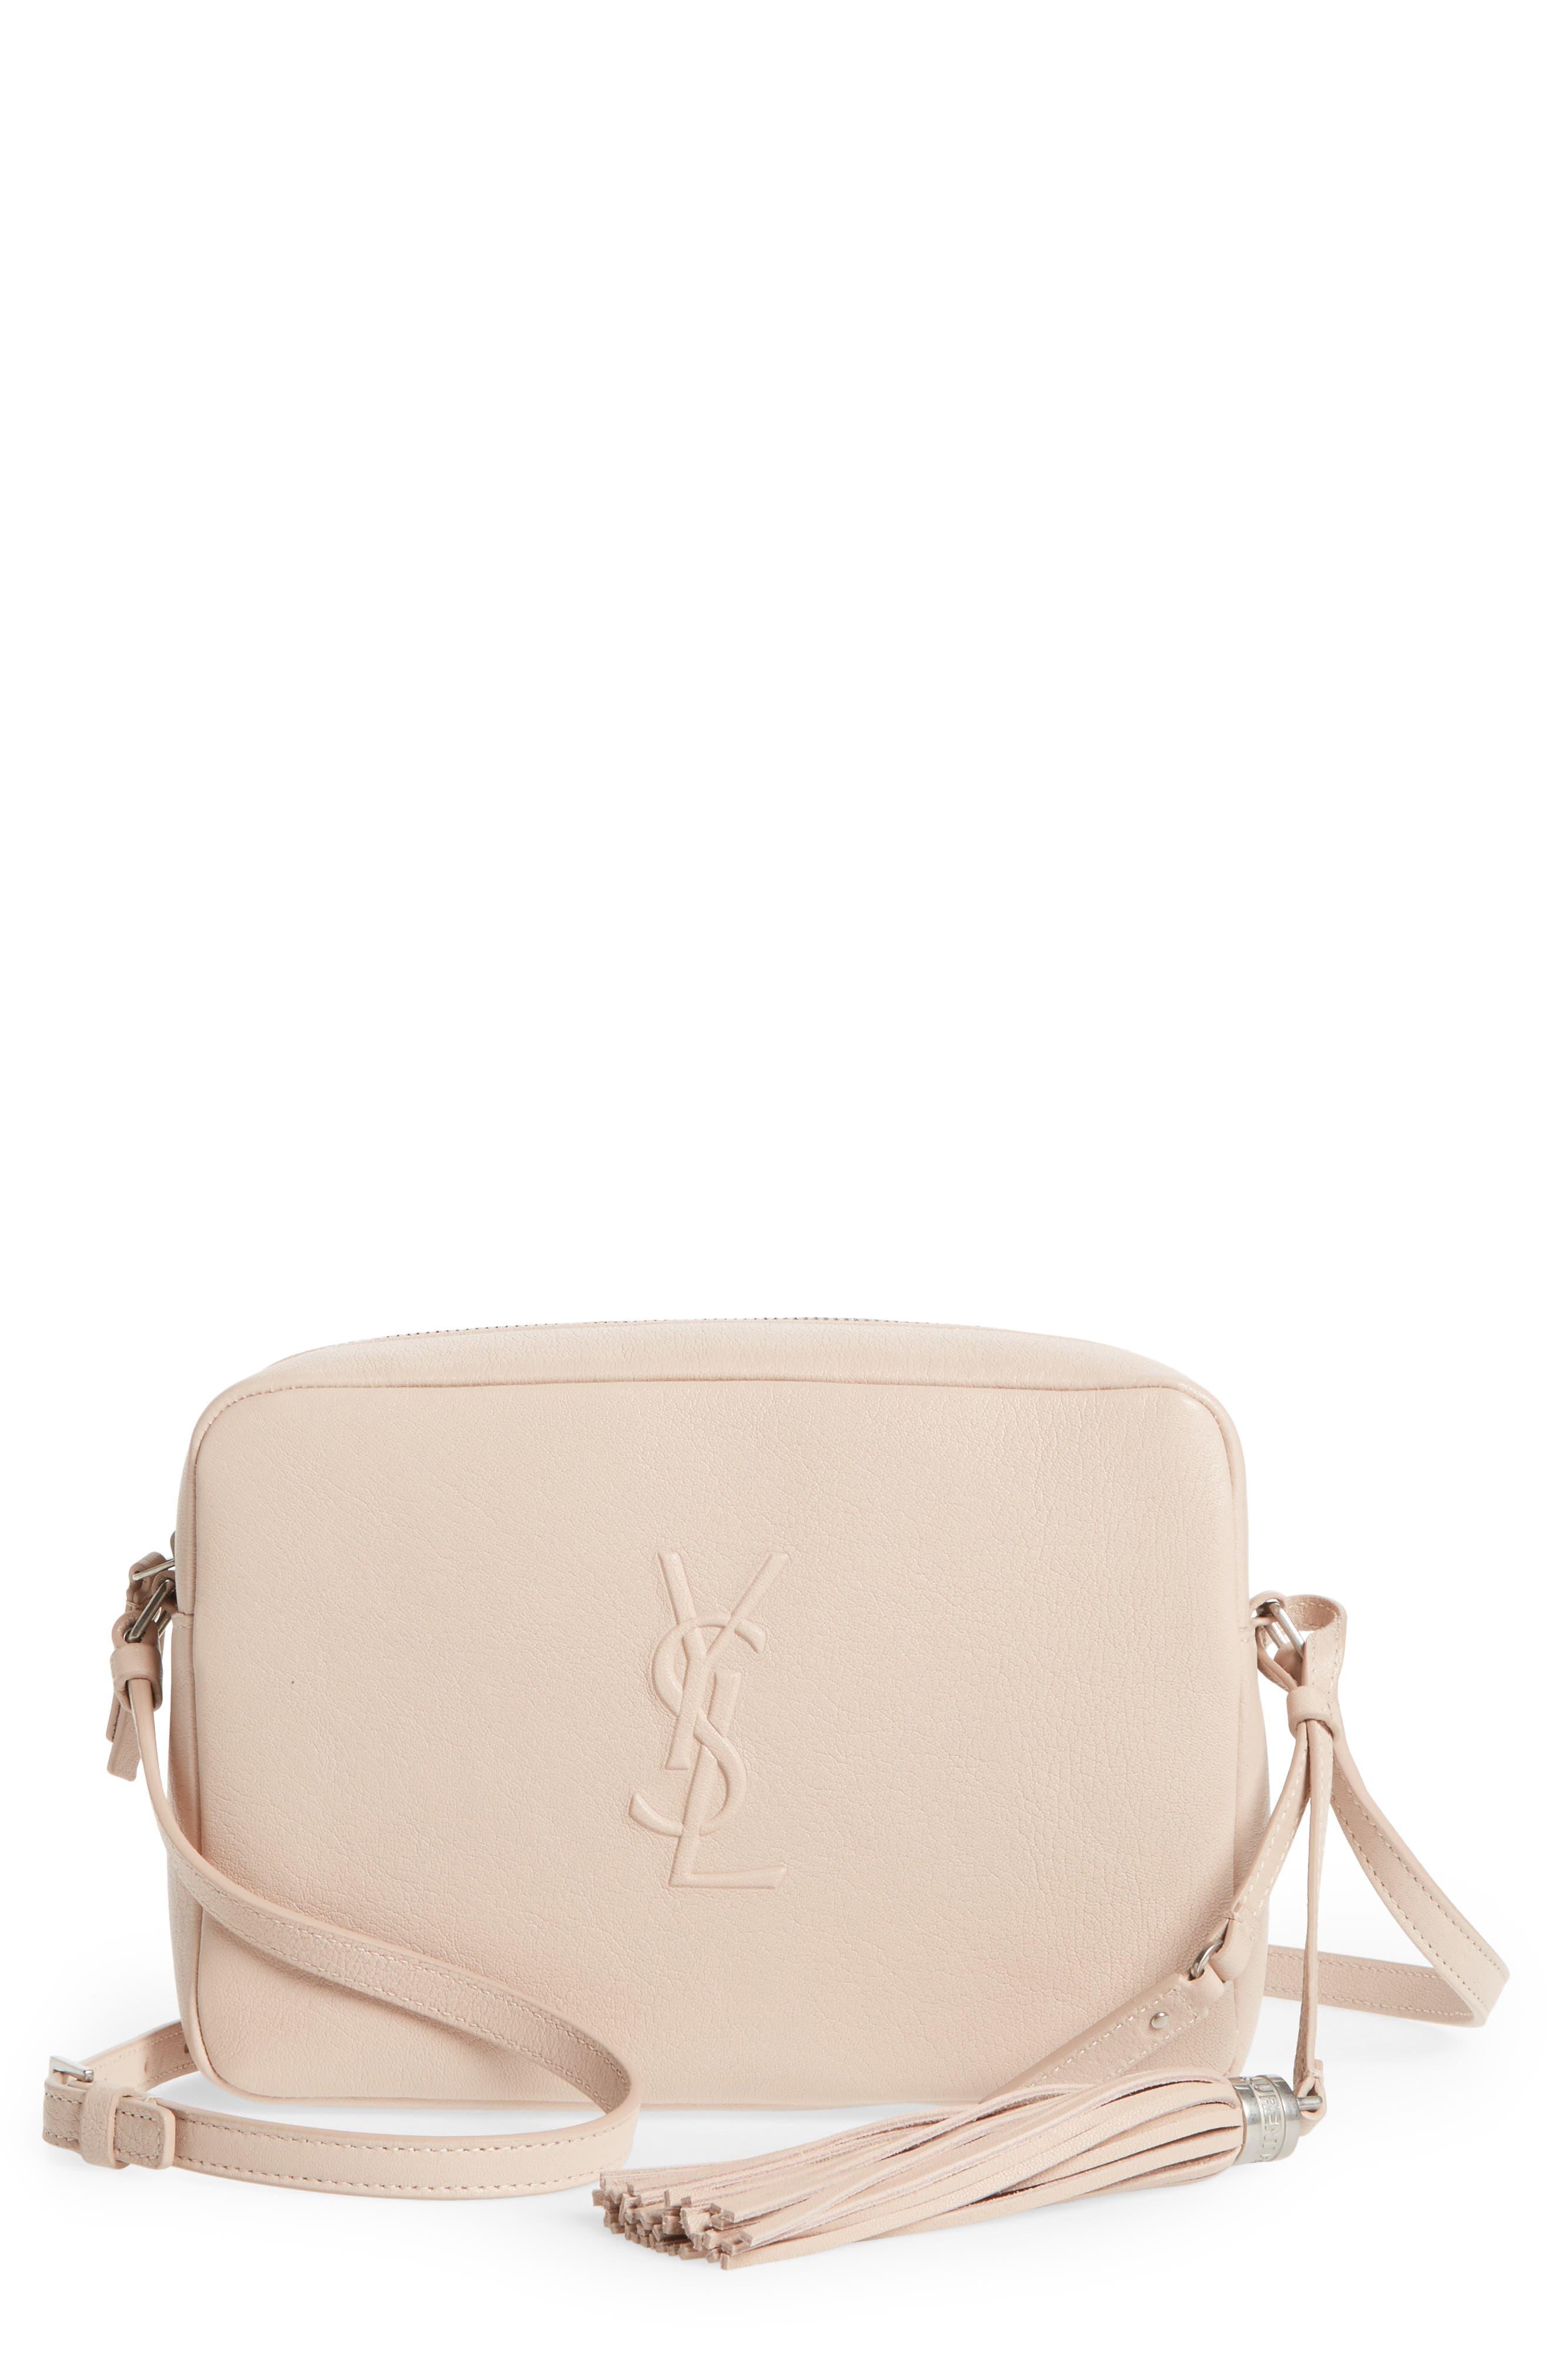 093da35e9e3 Shop for Best Price Saint Laurent Small Mono Leather Camera Bag Low ...